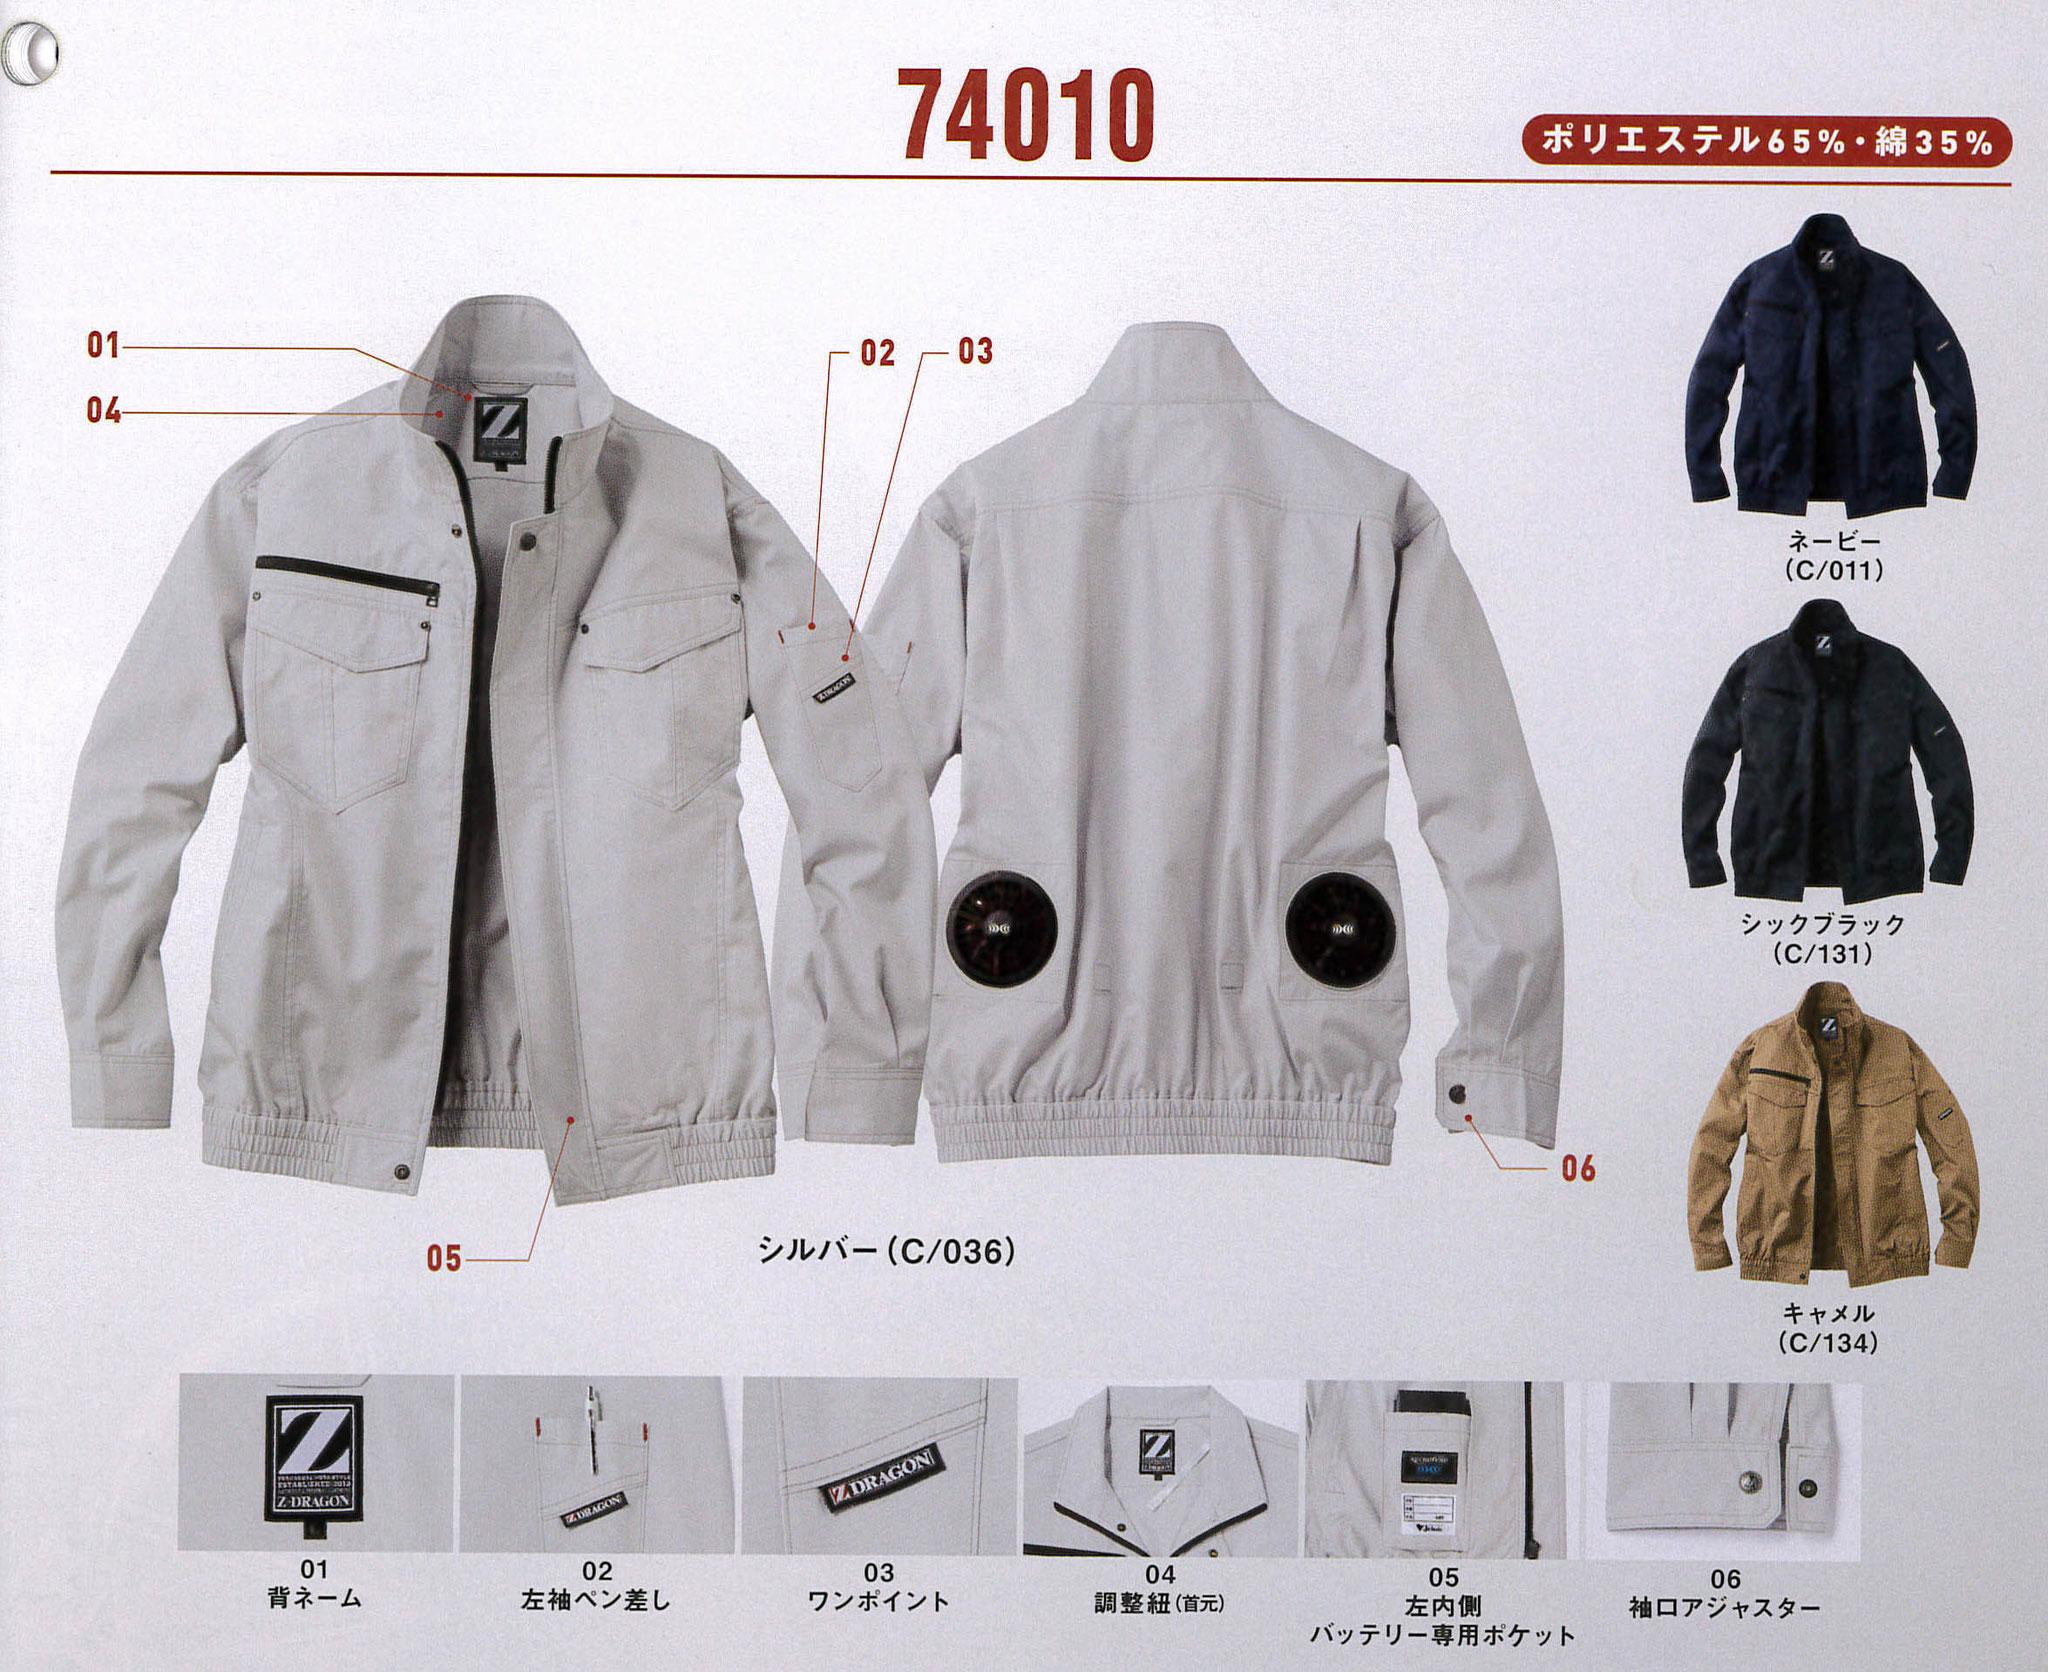 Z-DRAGON(ジードラゴン)74010 空調服ブルゾン 素材 ポリ65%・綿35%